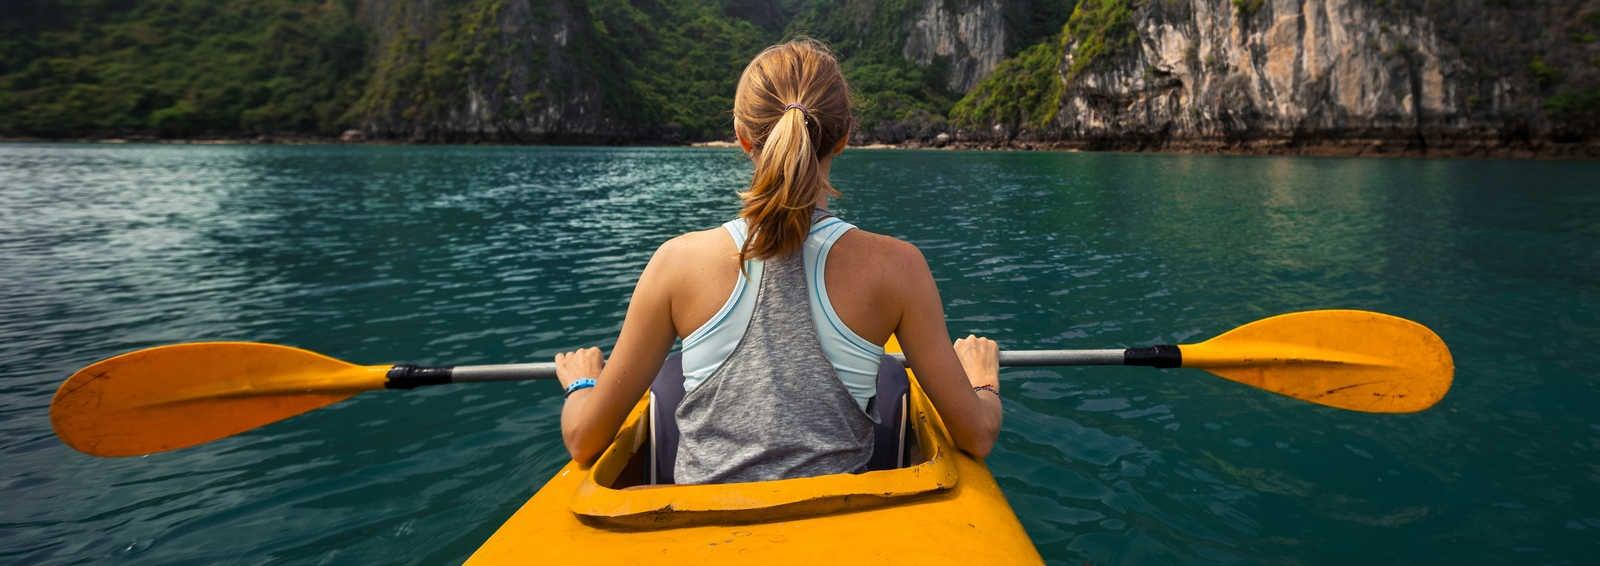 Woman exploring calm tropical bay with limestone mountains by kayak. Ha Long Bay, Vietnam